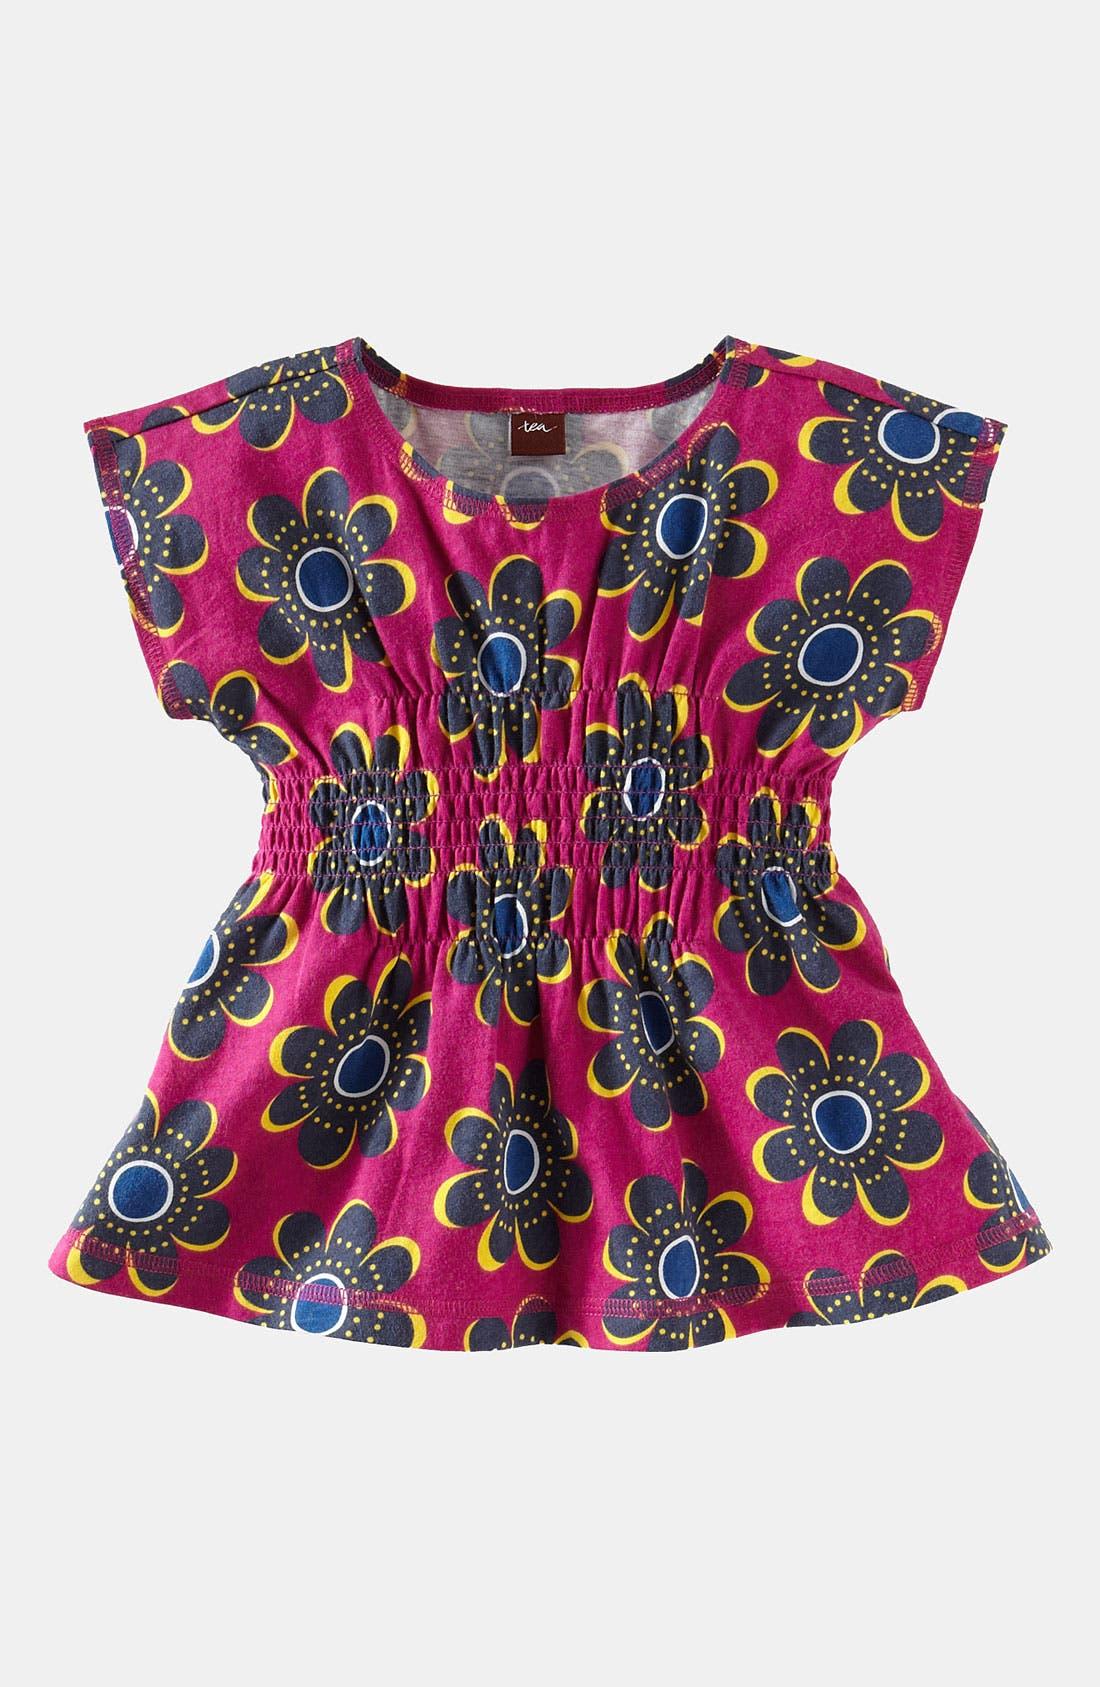 Main Image - Tea Collection 'Rosebank' Smocked Top (Toddler)